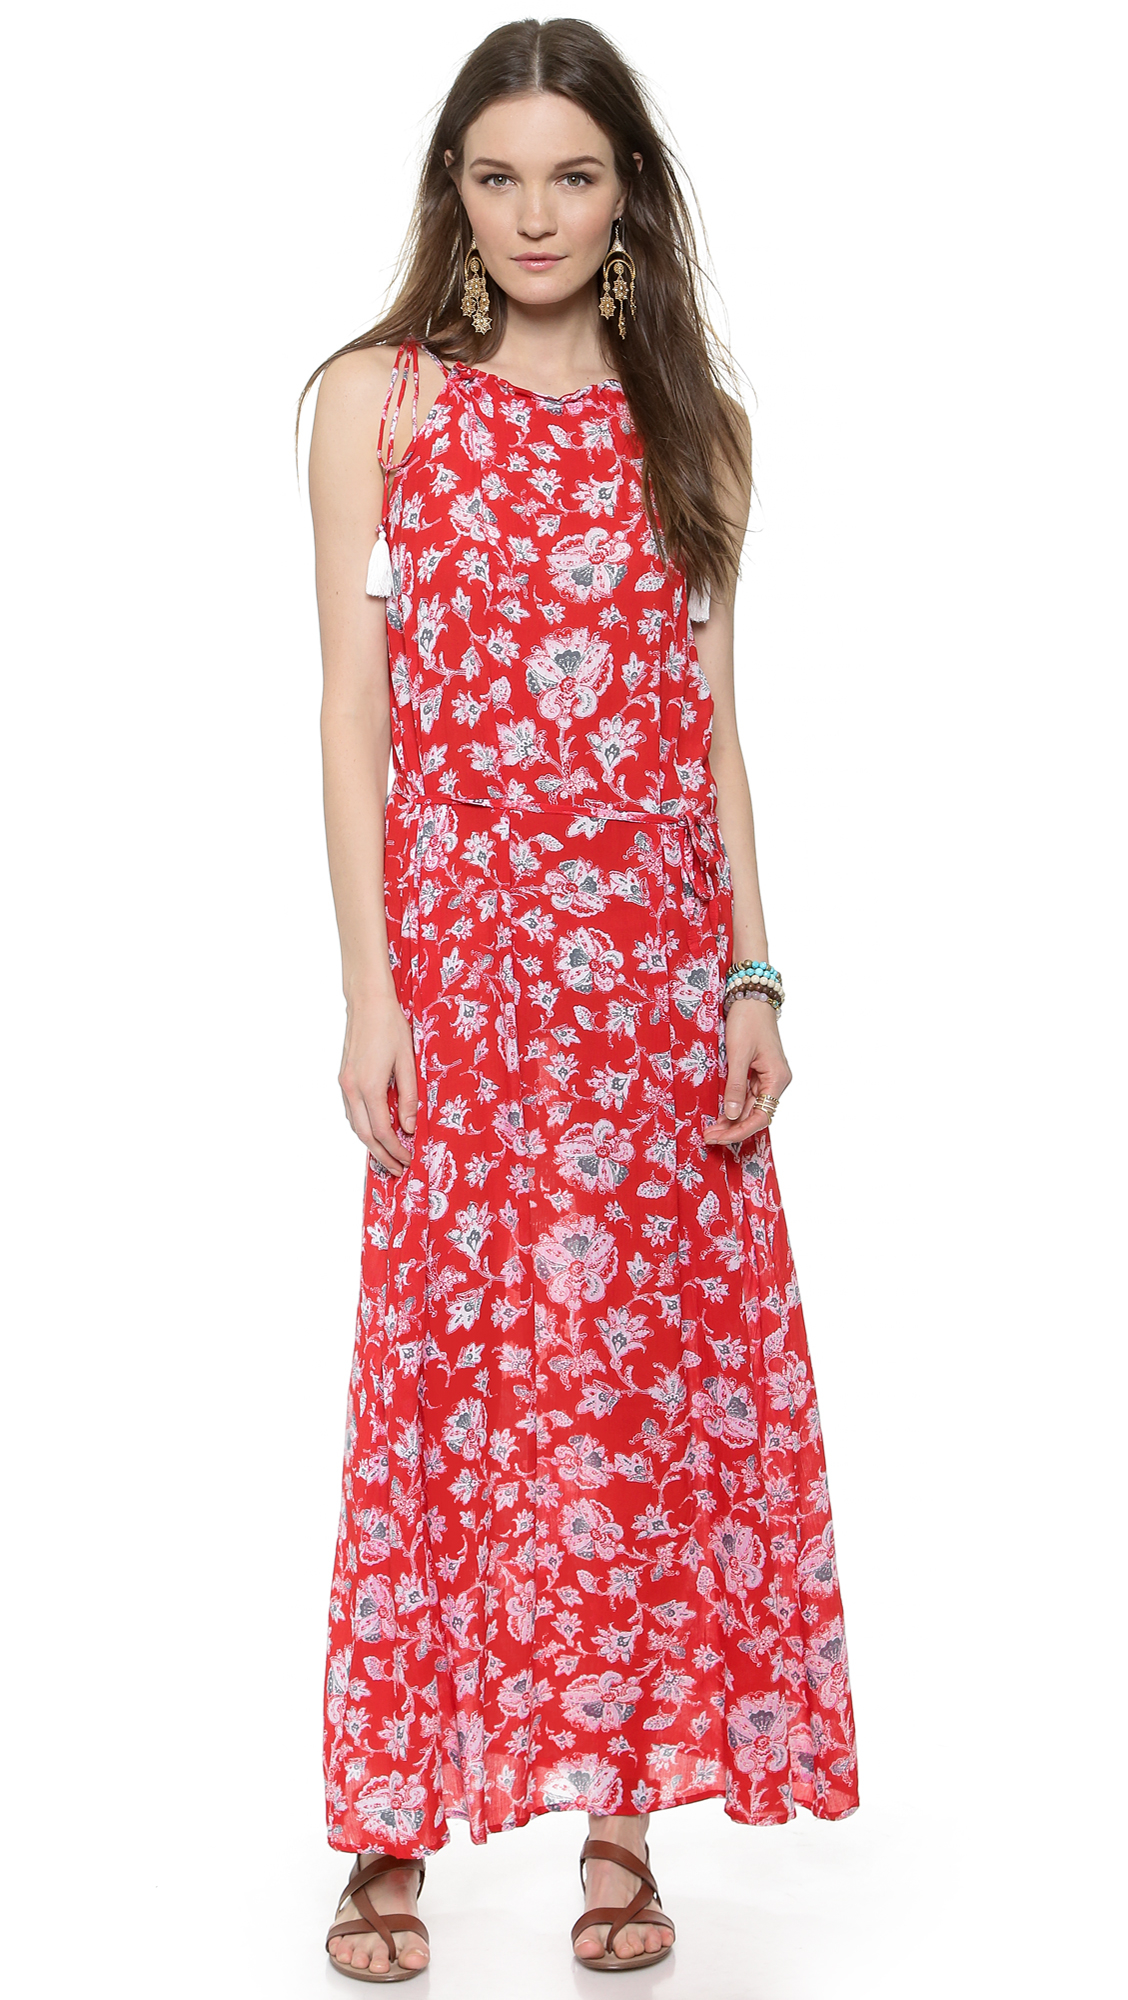 9c2bbcb81210 Lyst - Faithfull The Brand Getaway Maxi Dress - Summer Dreams Print ...